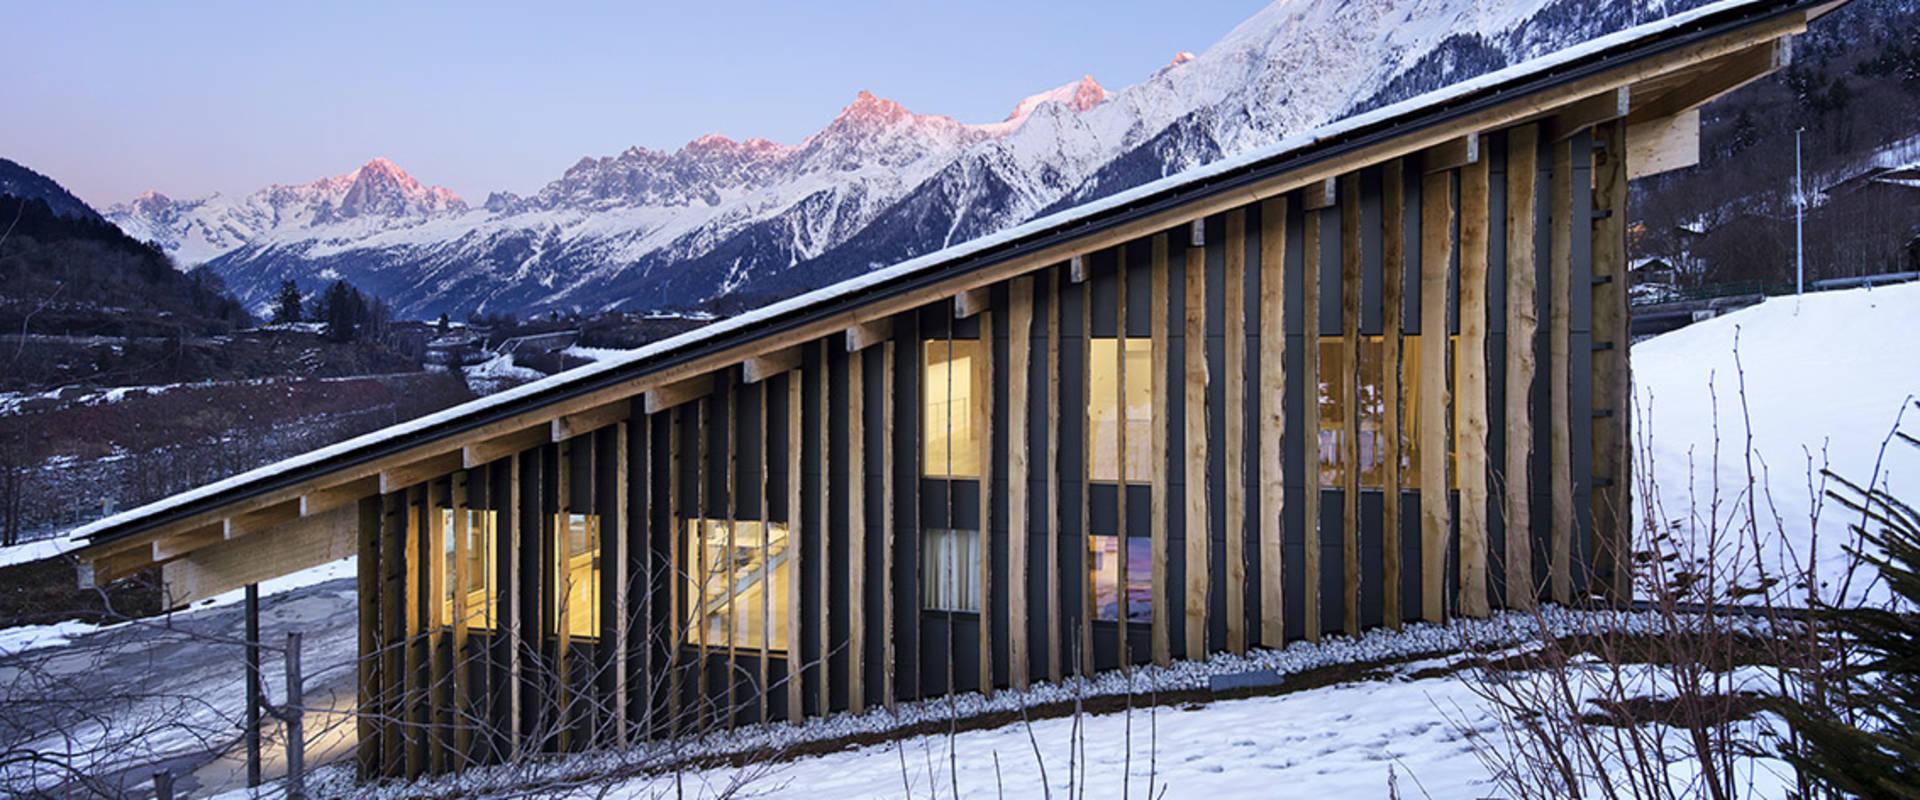 Mont-Blanc-Base-Camp